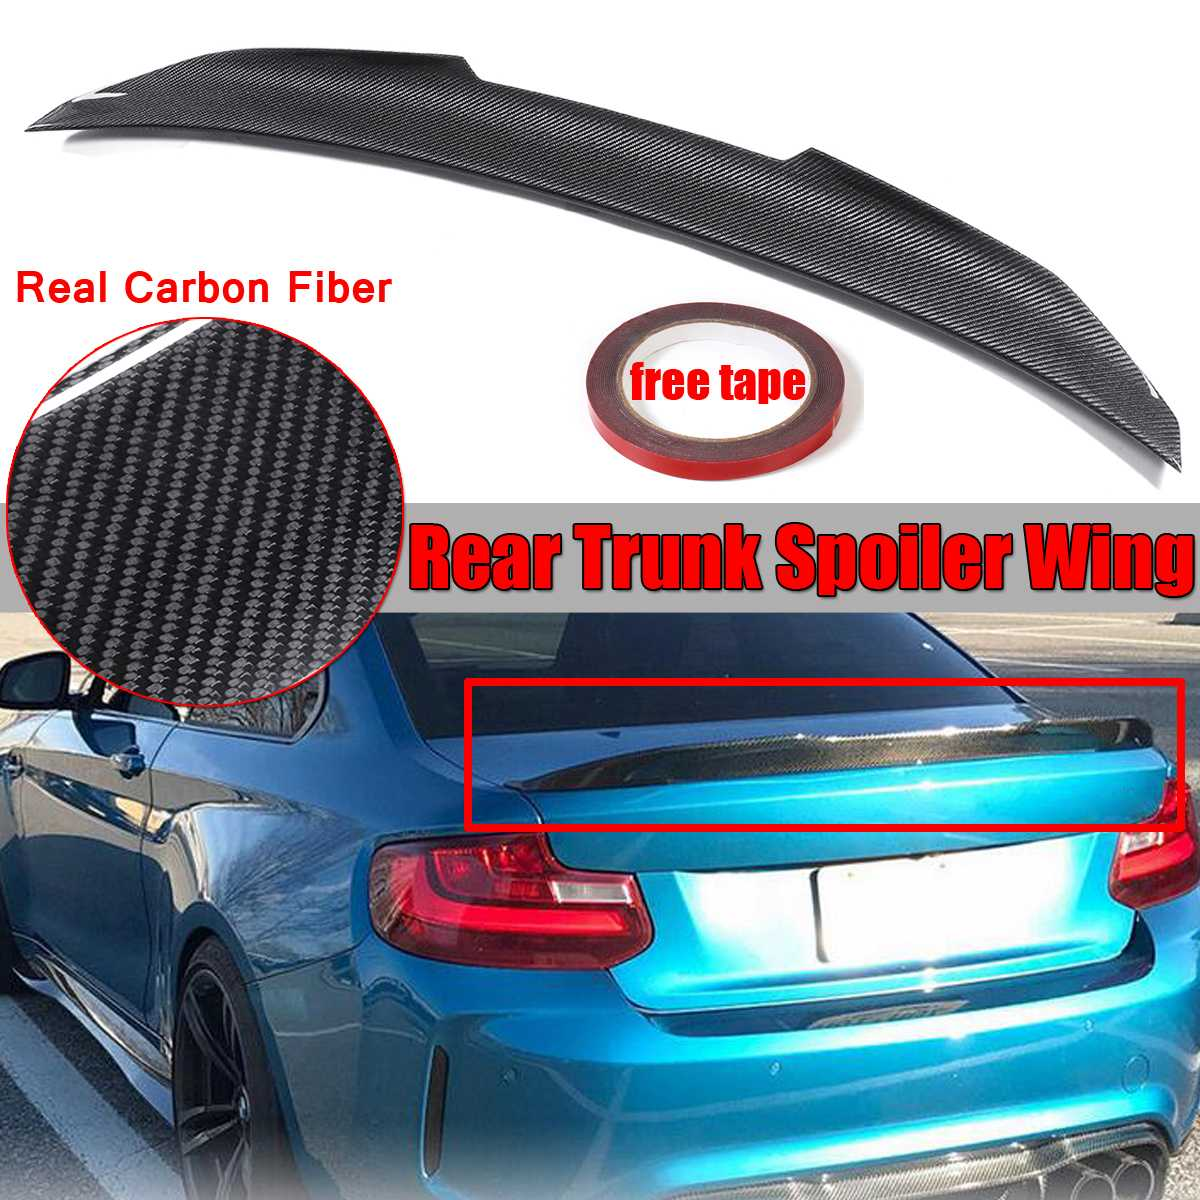 1x de fibra de carbono Real PSM estilo coche alerón trasero para maletero Spoiler ala tapa para BMW F22 M235i F87 M2 2014, 2015, 2016, 2017, 2018